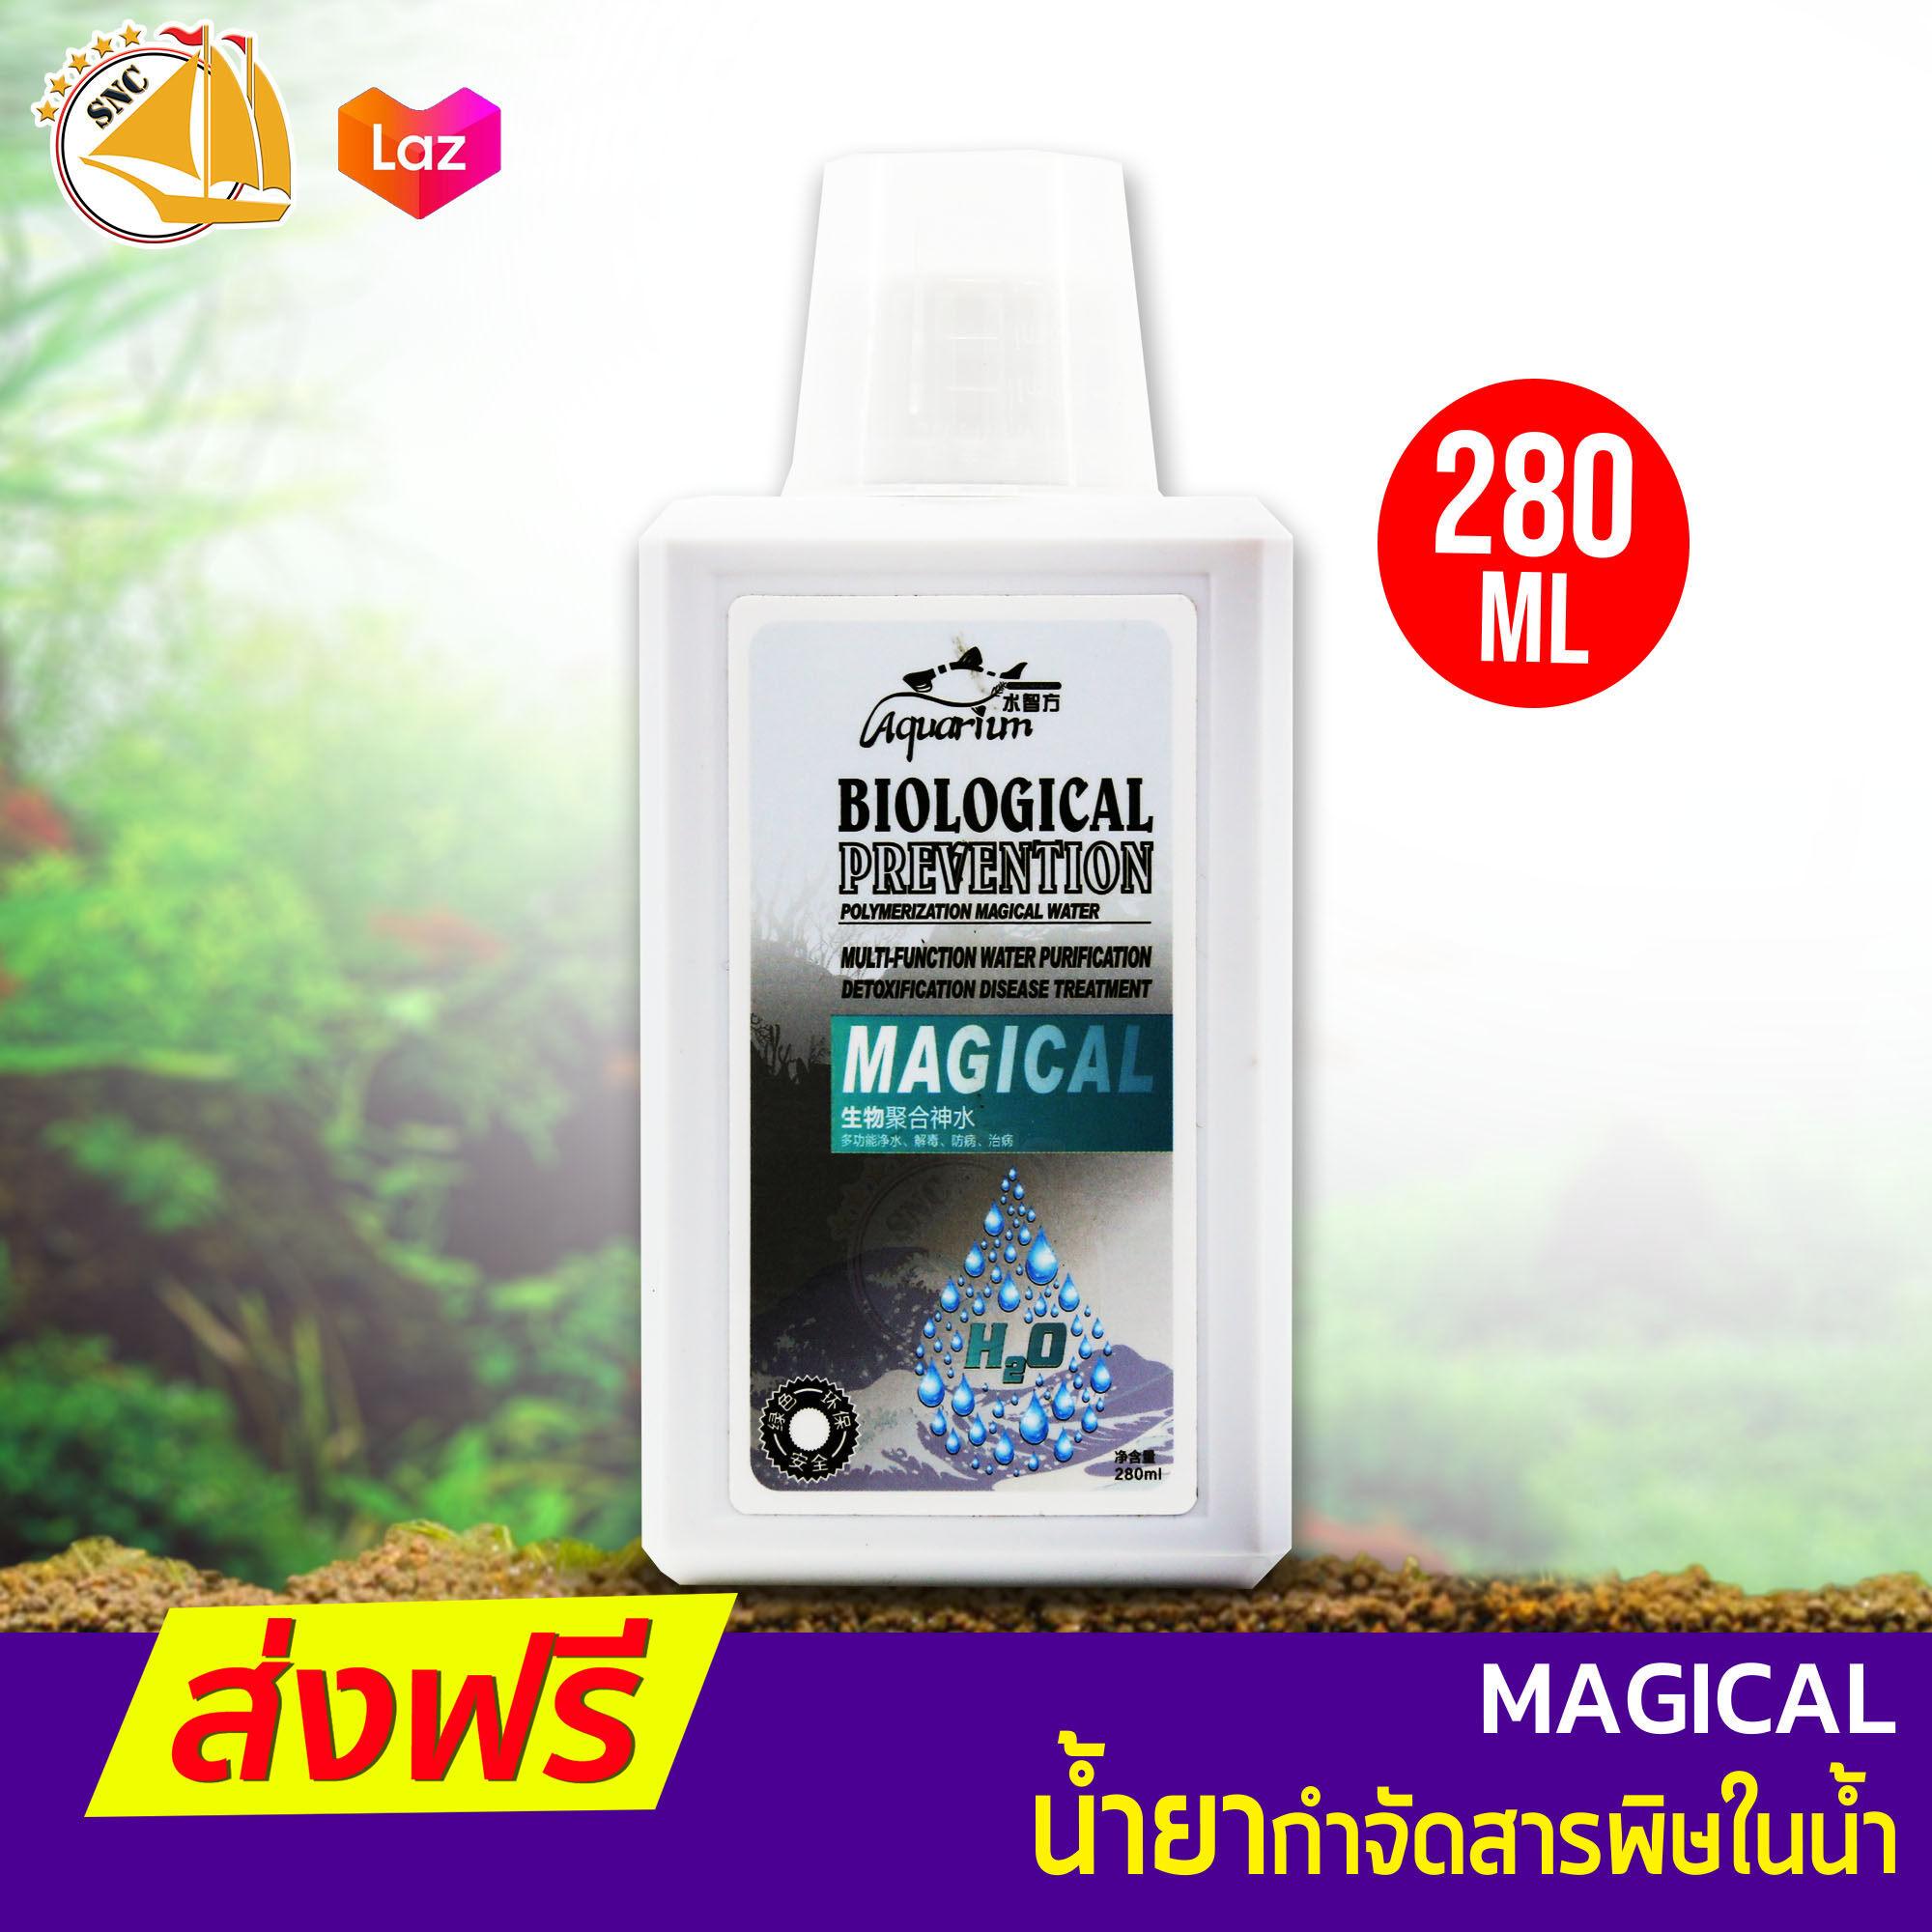 BIOLOGICAL Aquarium Magical กำจัดสารพิษในน้ำ ทำให้น้ำสะอาด ป้องกันโรค บรรจุ 280 ml